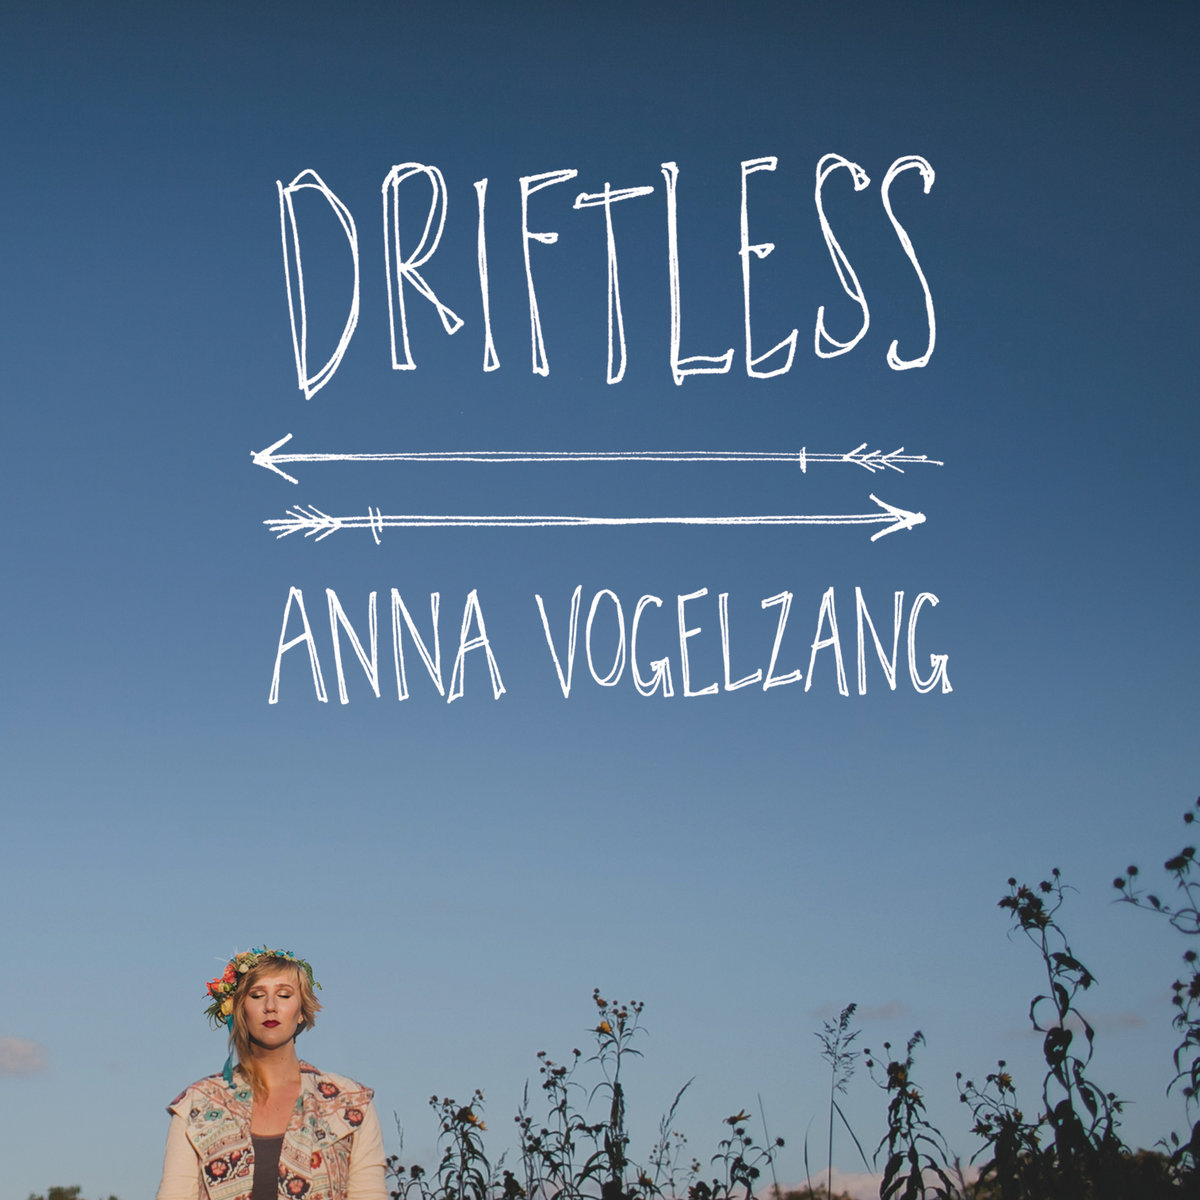 Heart Beat Faster | Anna Vogelzang